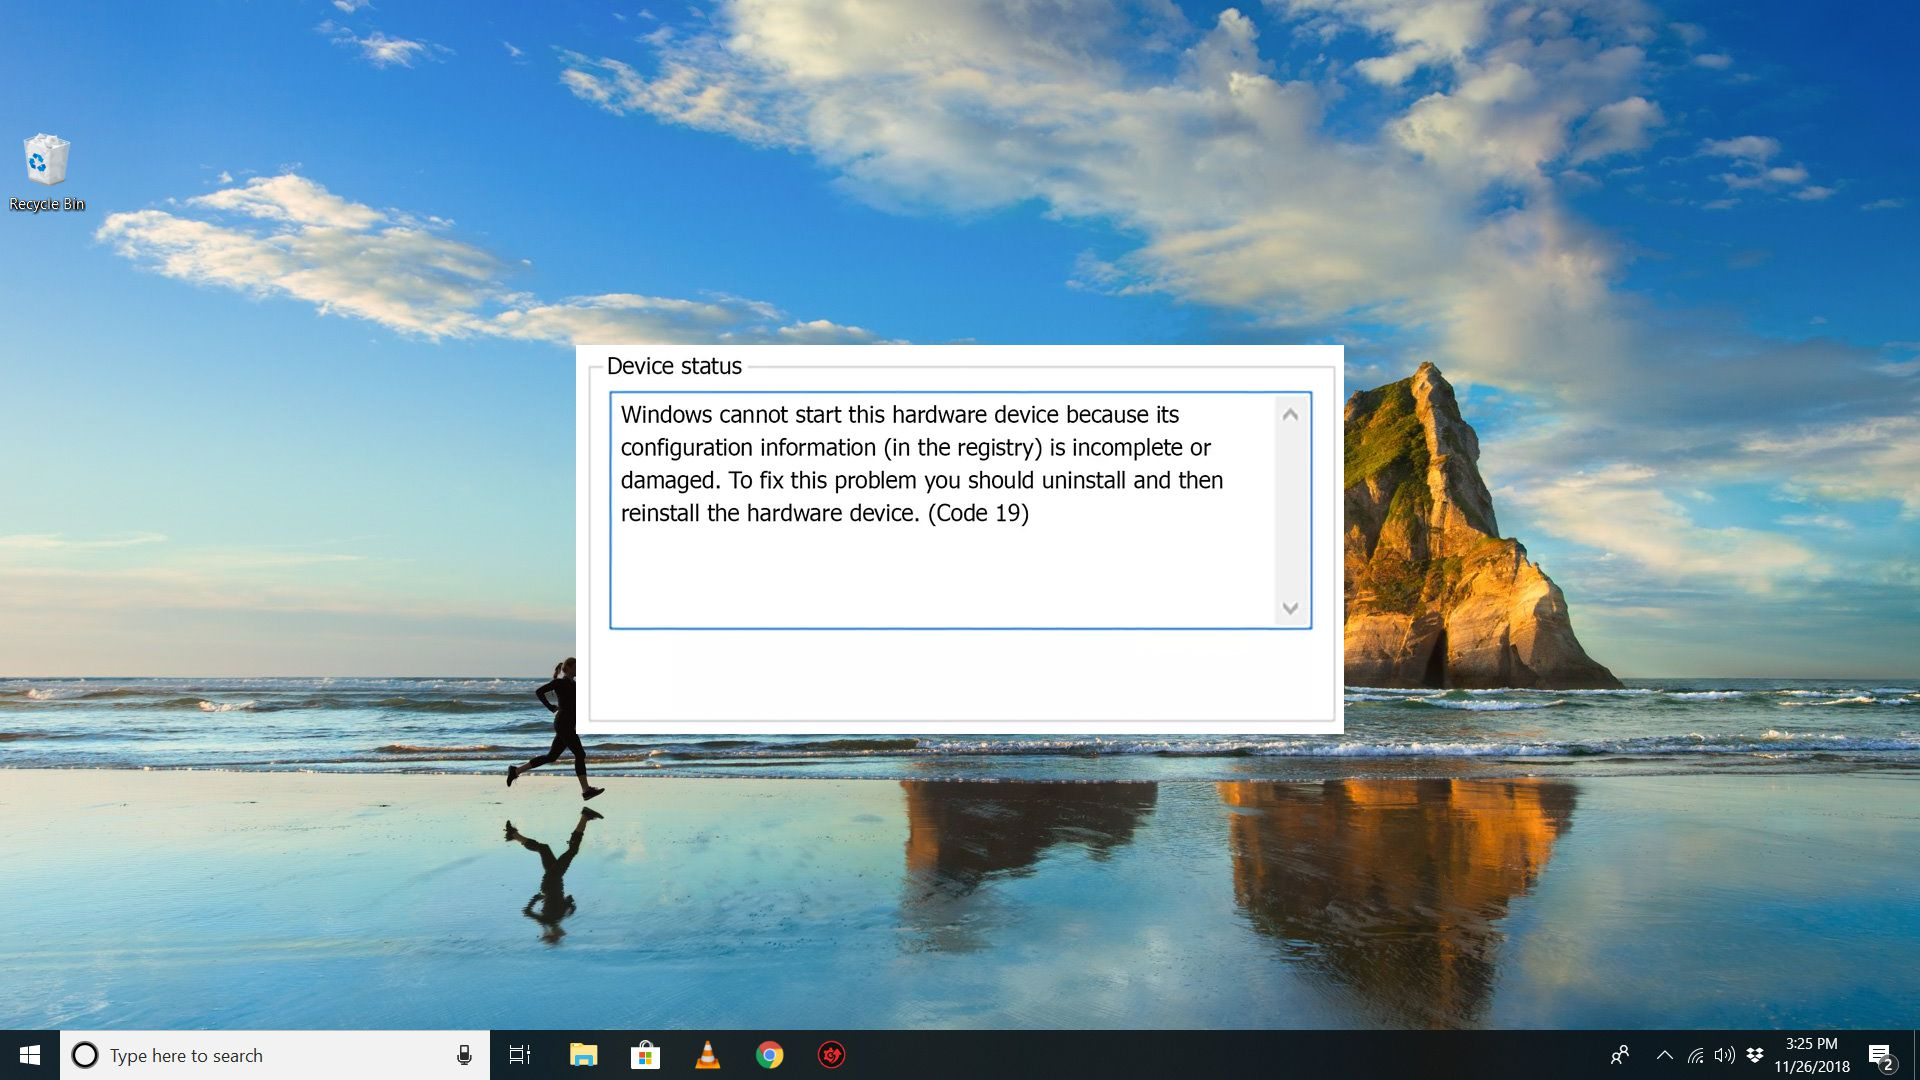 How to Fix Code 19 Errors in Windows